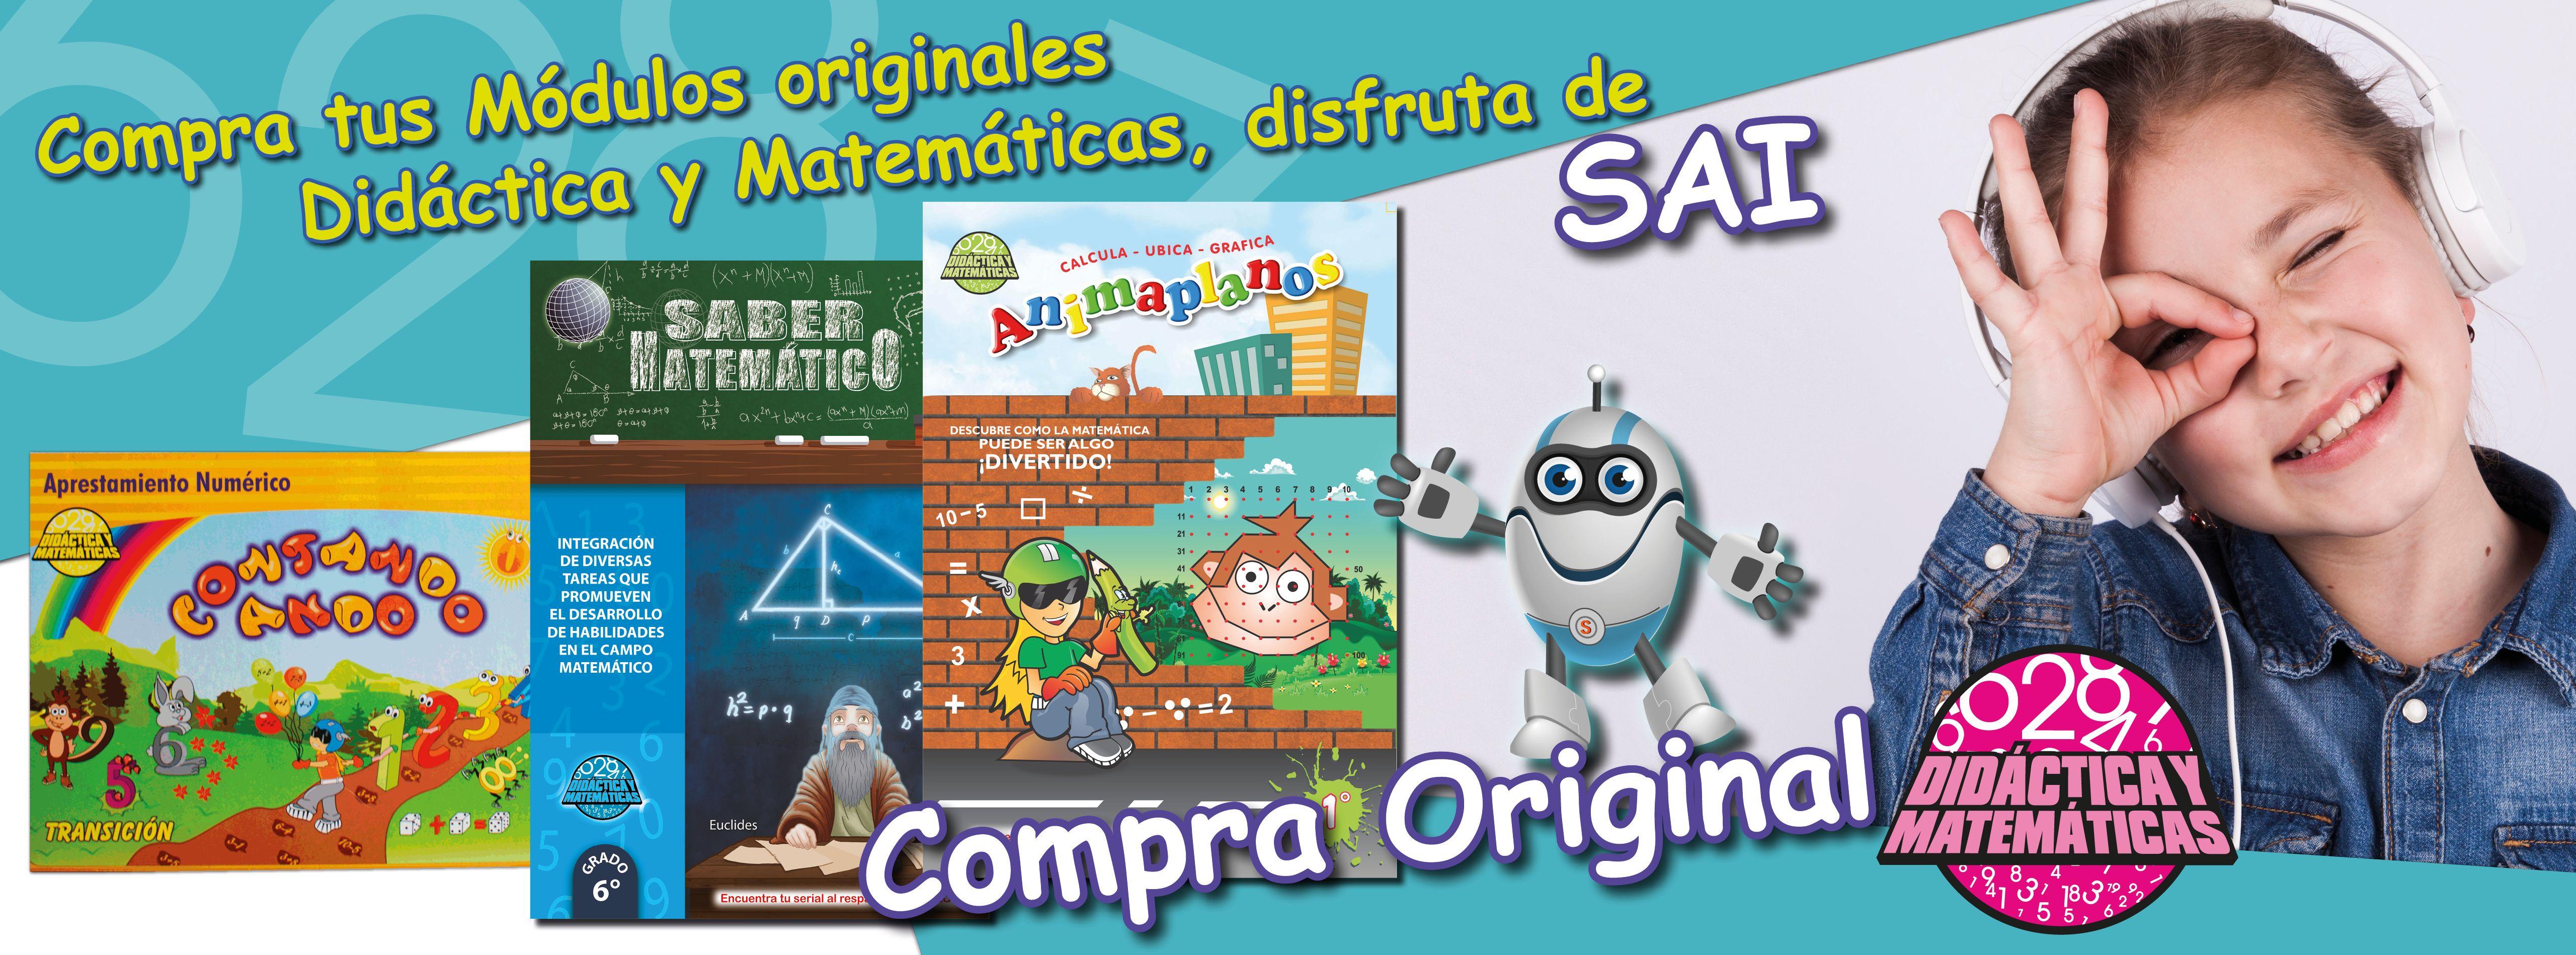 sai-compra-original-didacticaymatematicas1-c